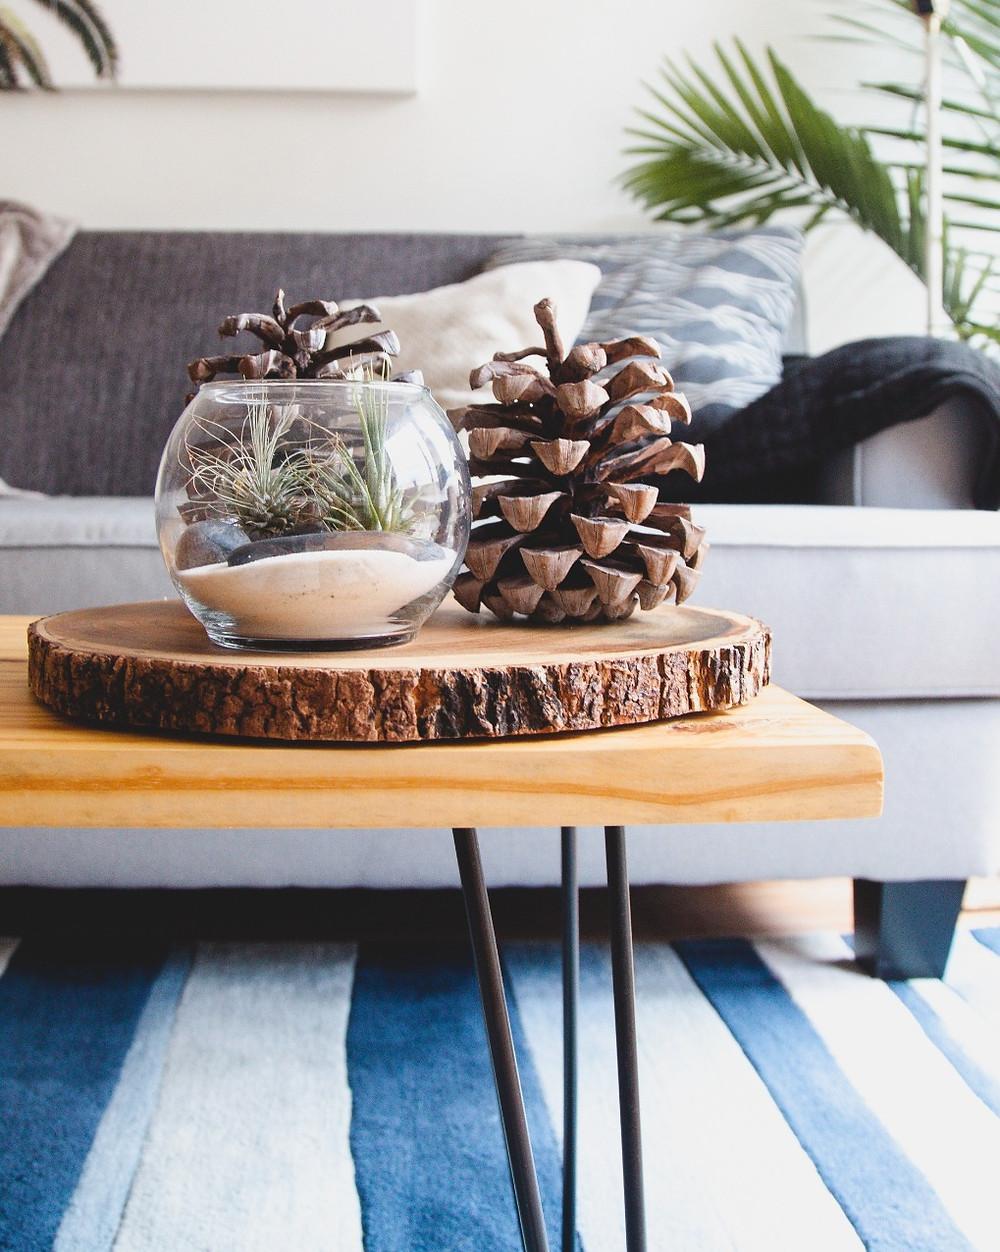 Luxury Apartments For Rent in Winnipeg | Ironclad Properties Inc.